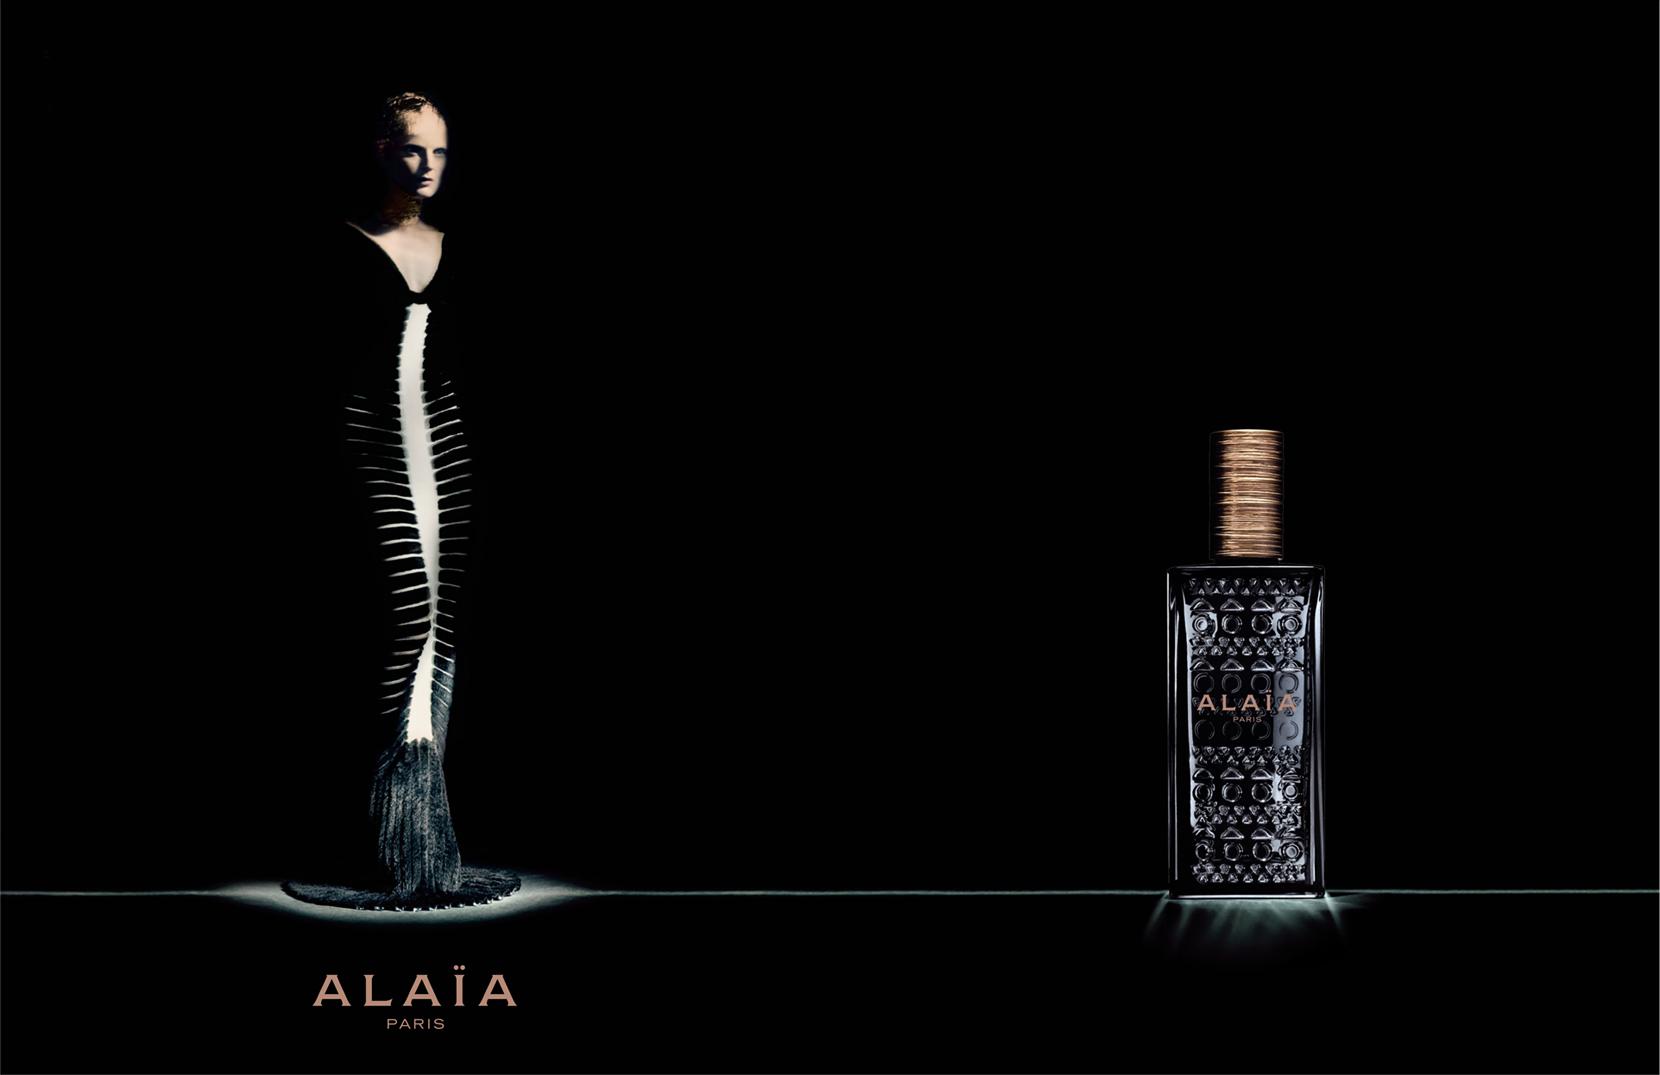 Szybka trójka: Azzedine Alaia Alaia Paris,Sisley eau Tropicale, Yves Rocher Accord Chic